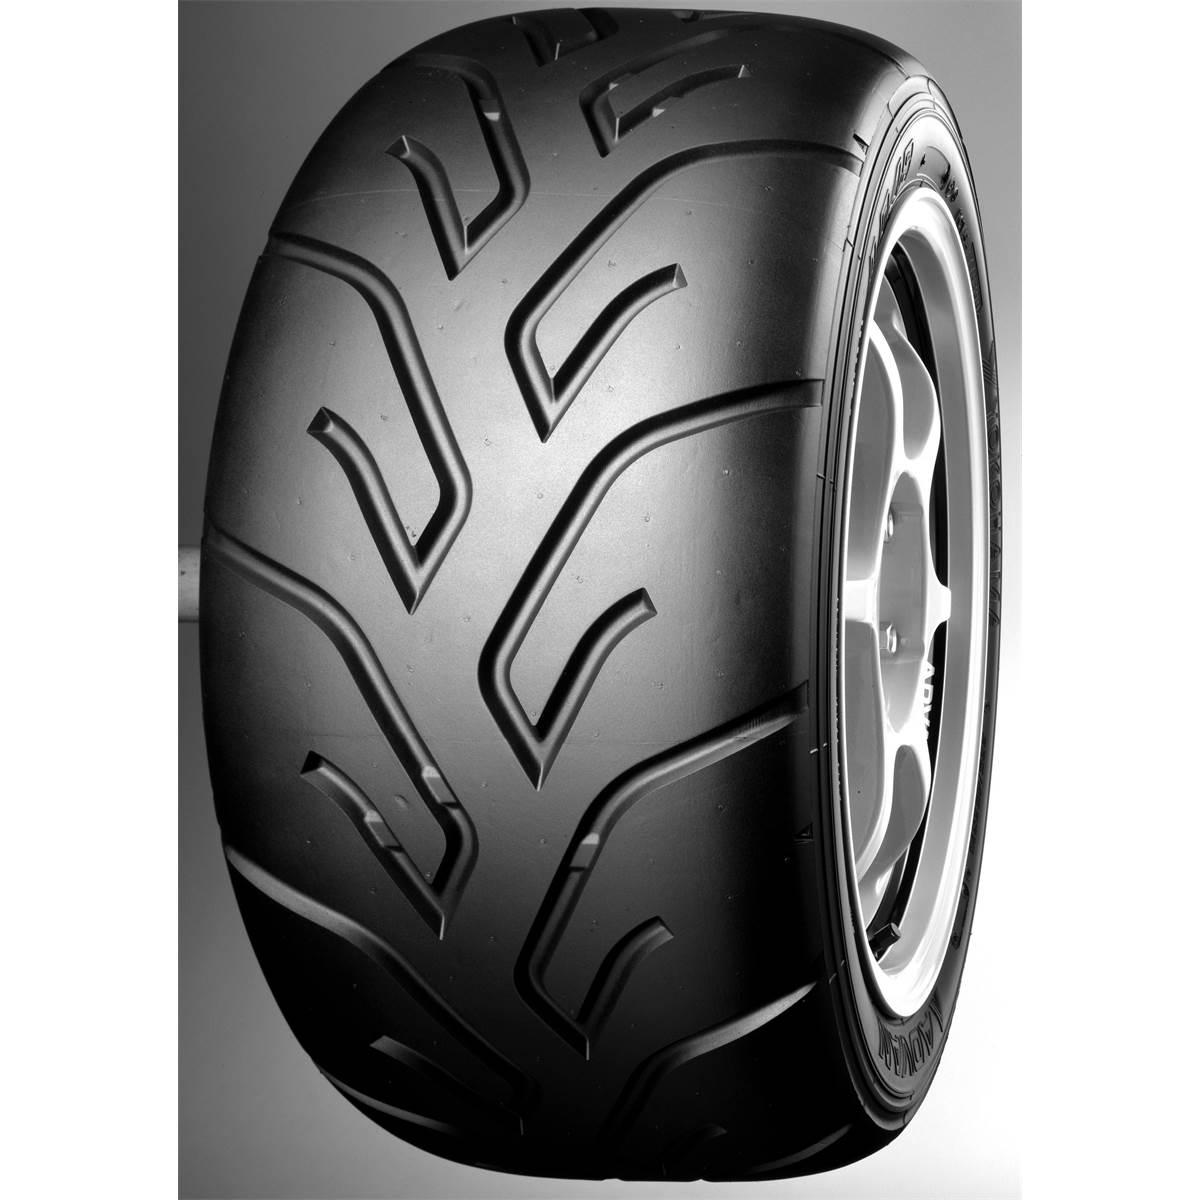 Comparer les prix des pneus Yokohama Advan A048